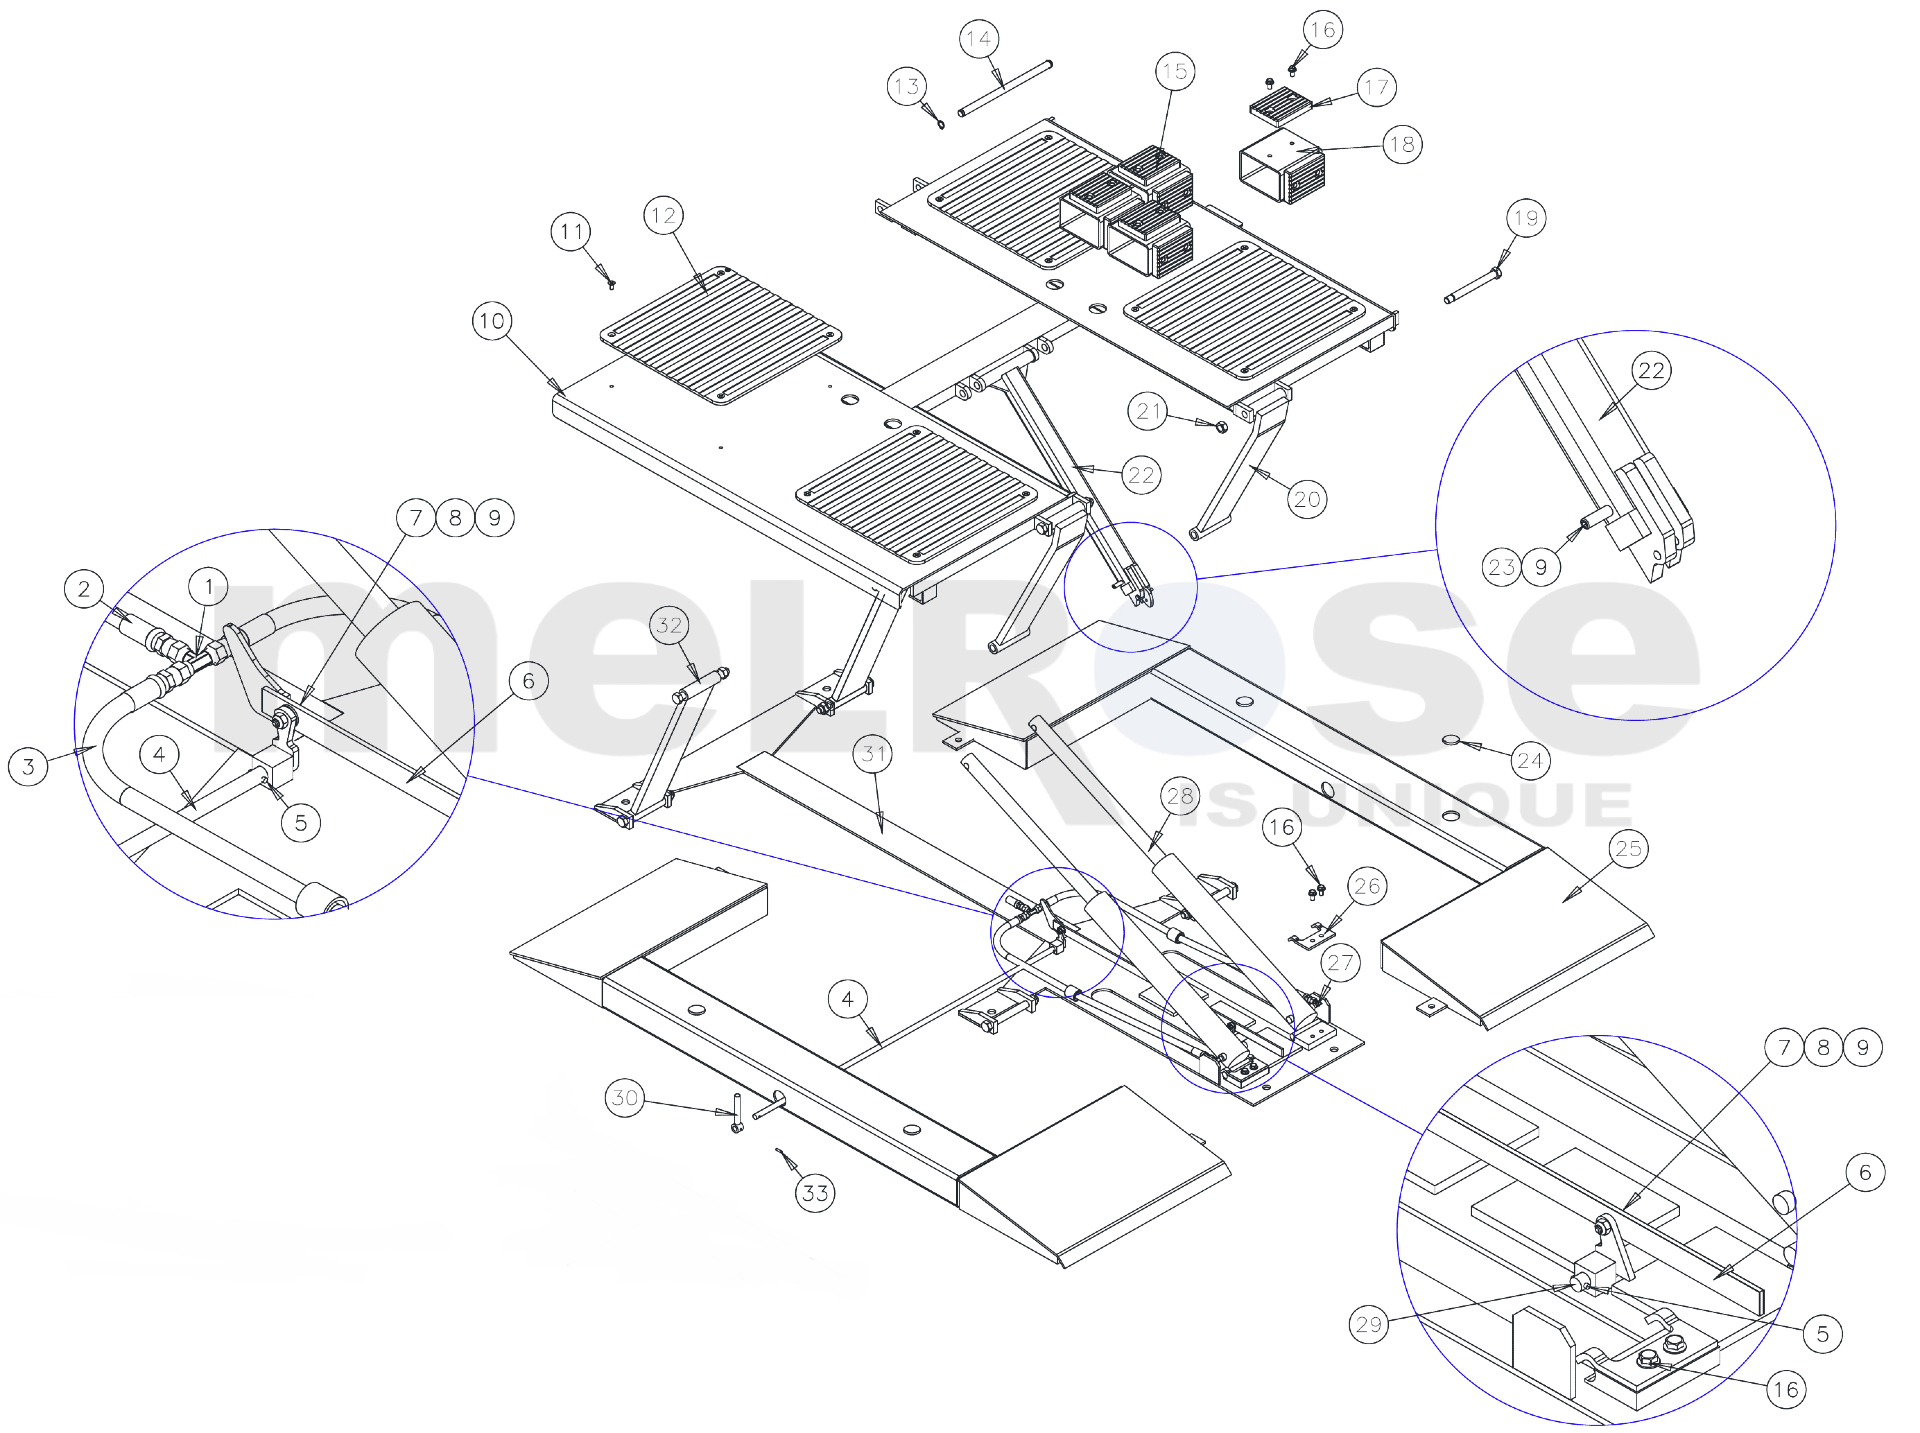 srm10-complete-lift-diagram-marked.jpg